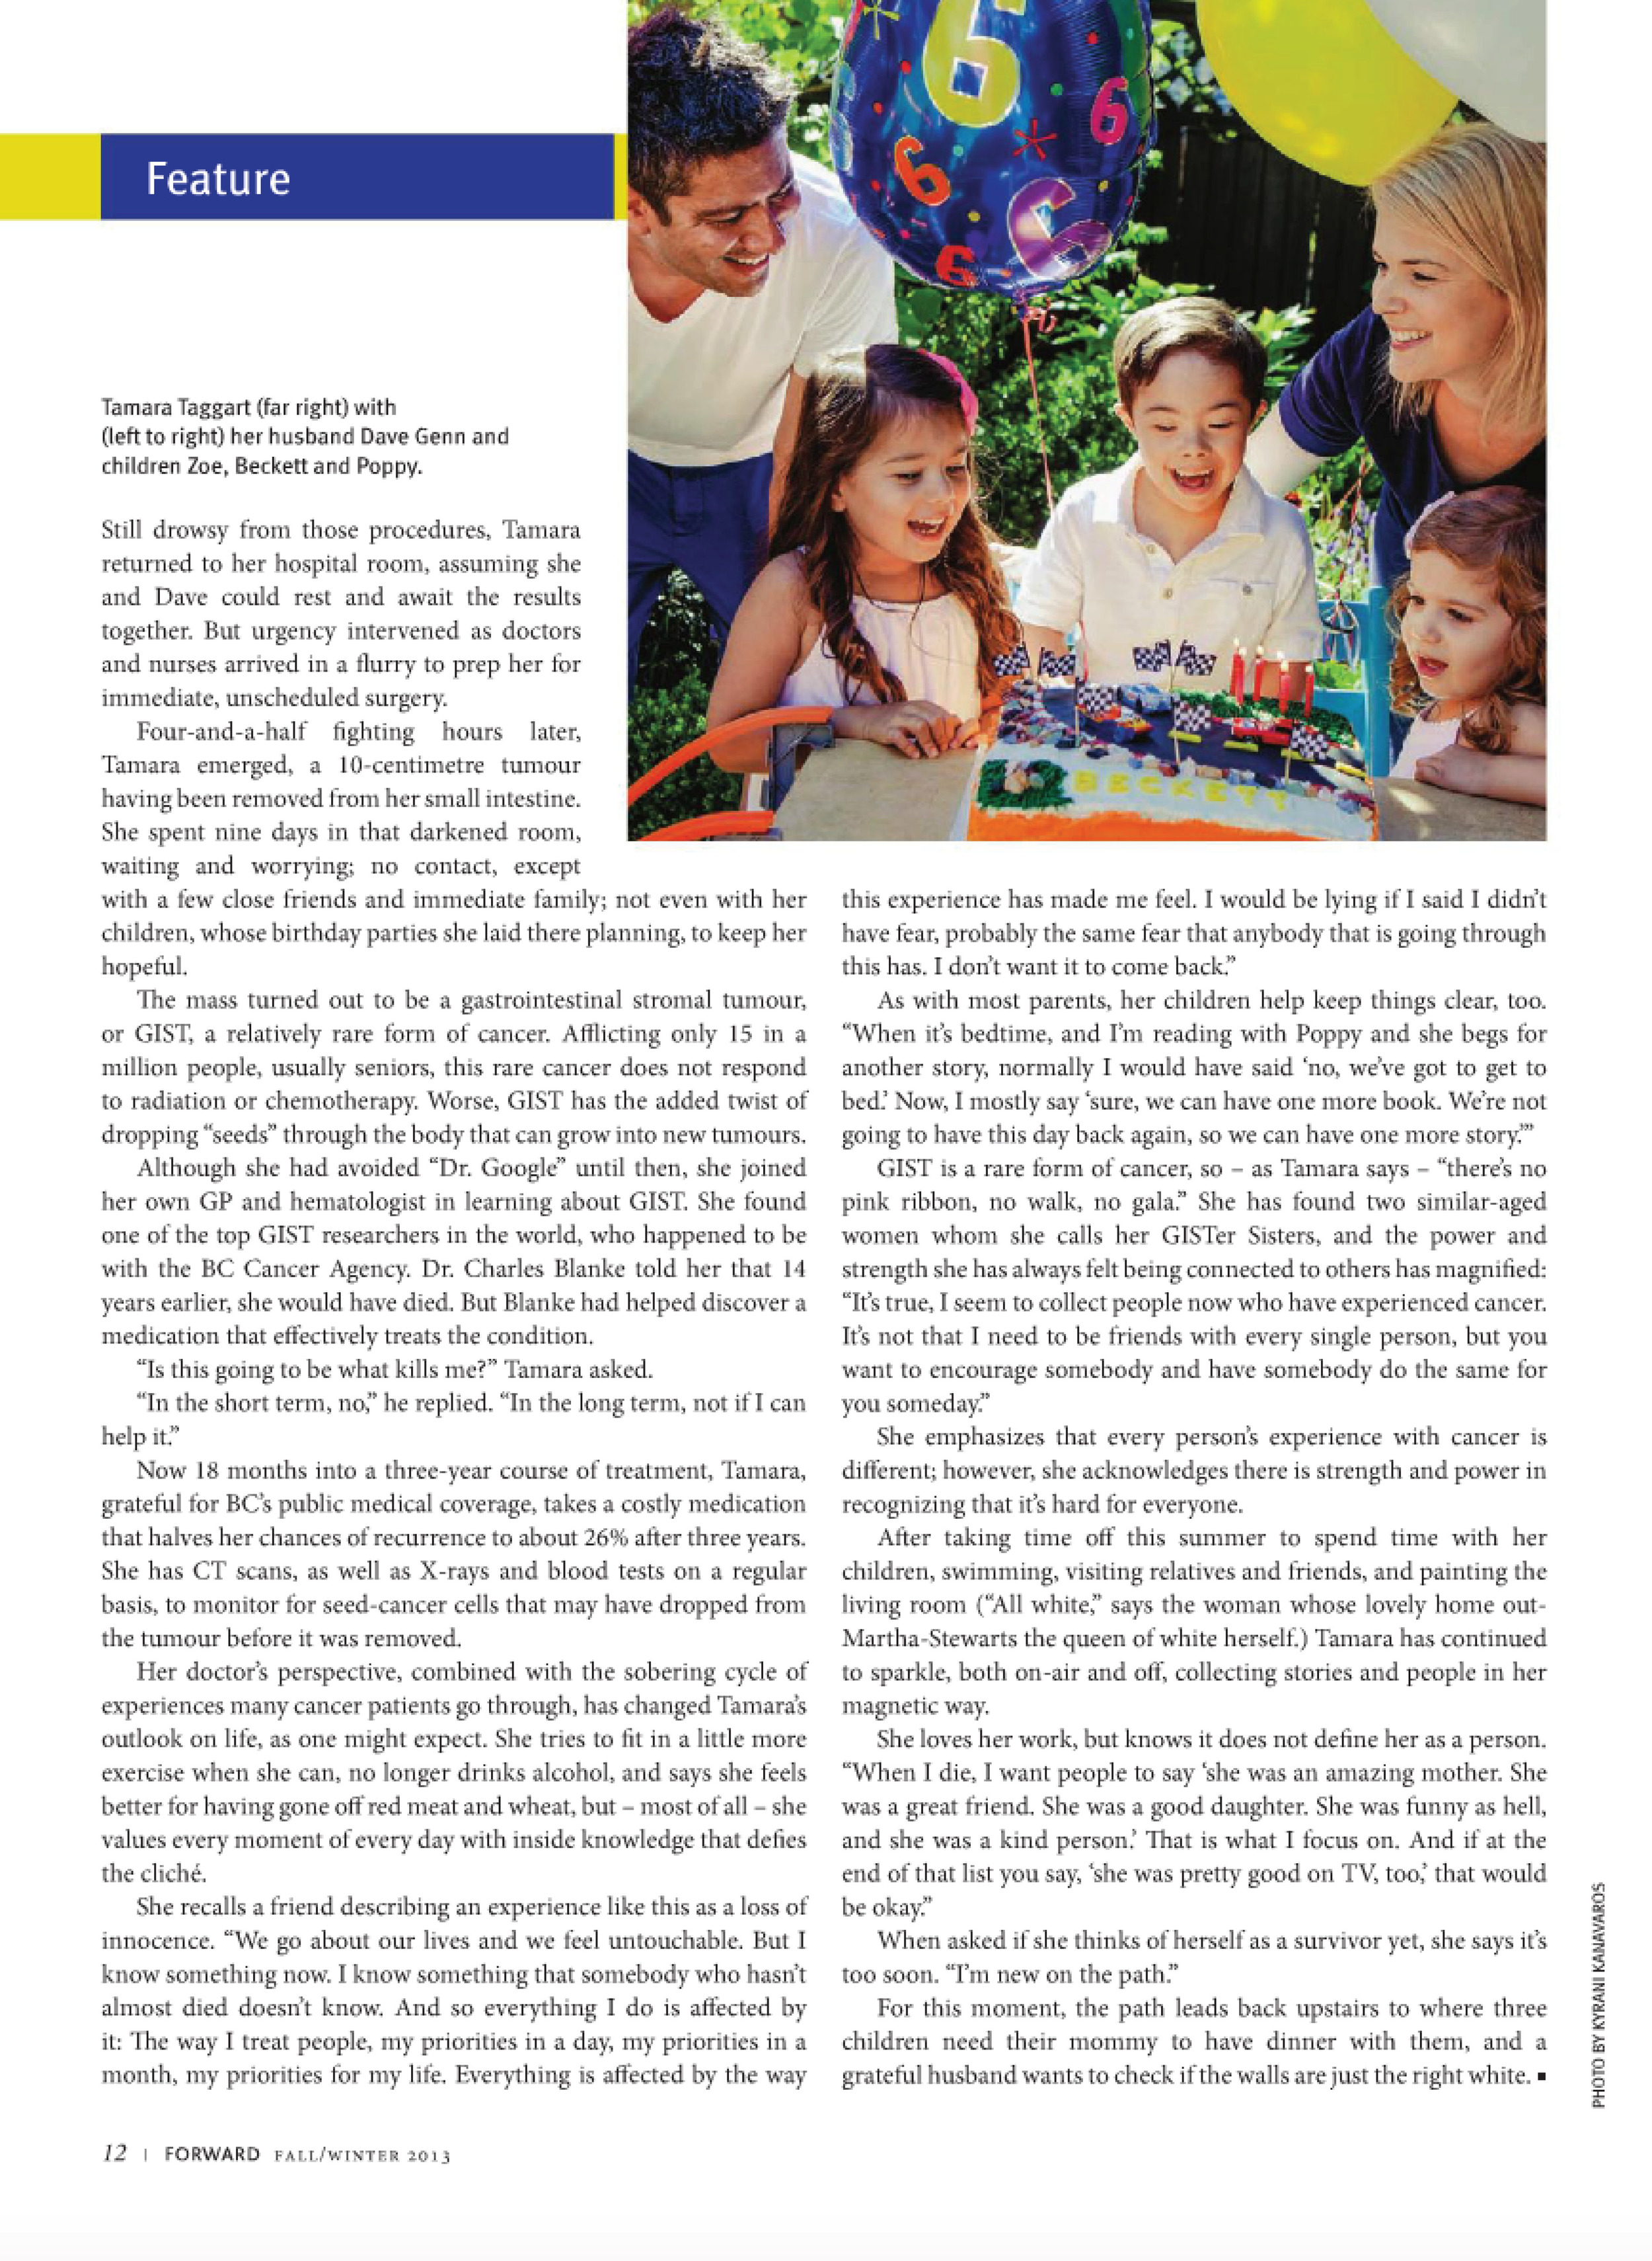 forward magazine 3.jpg